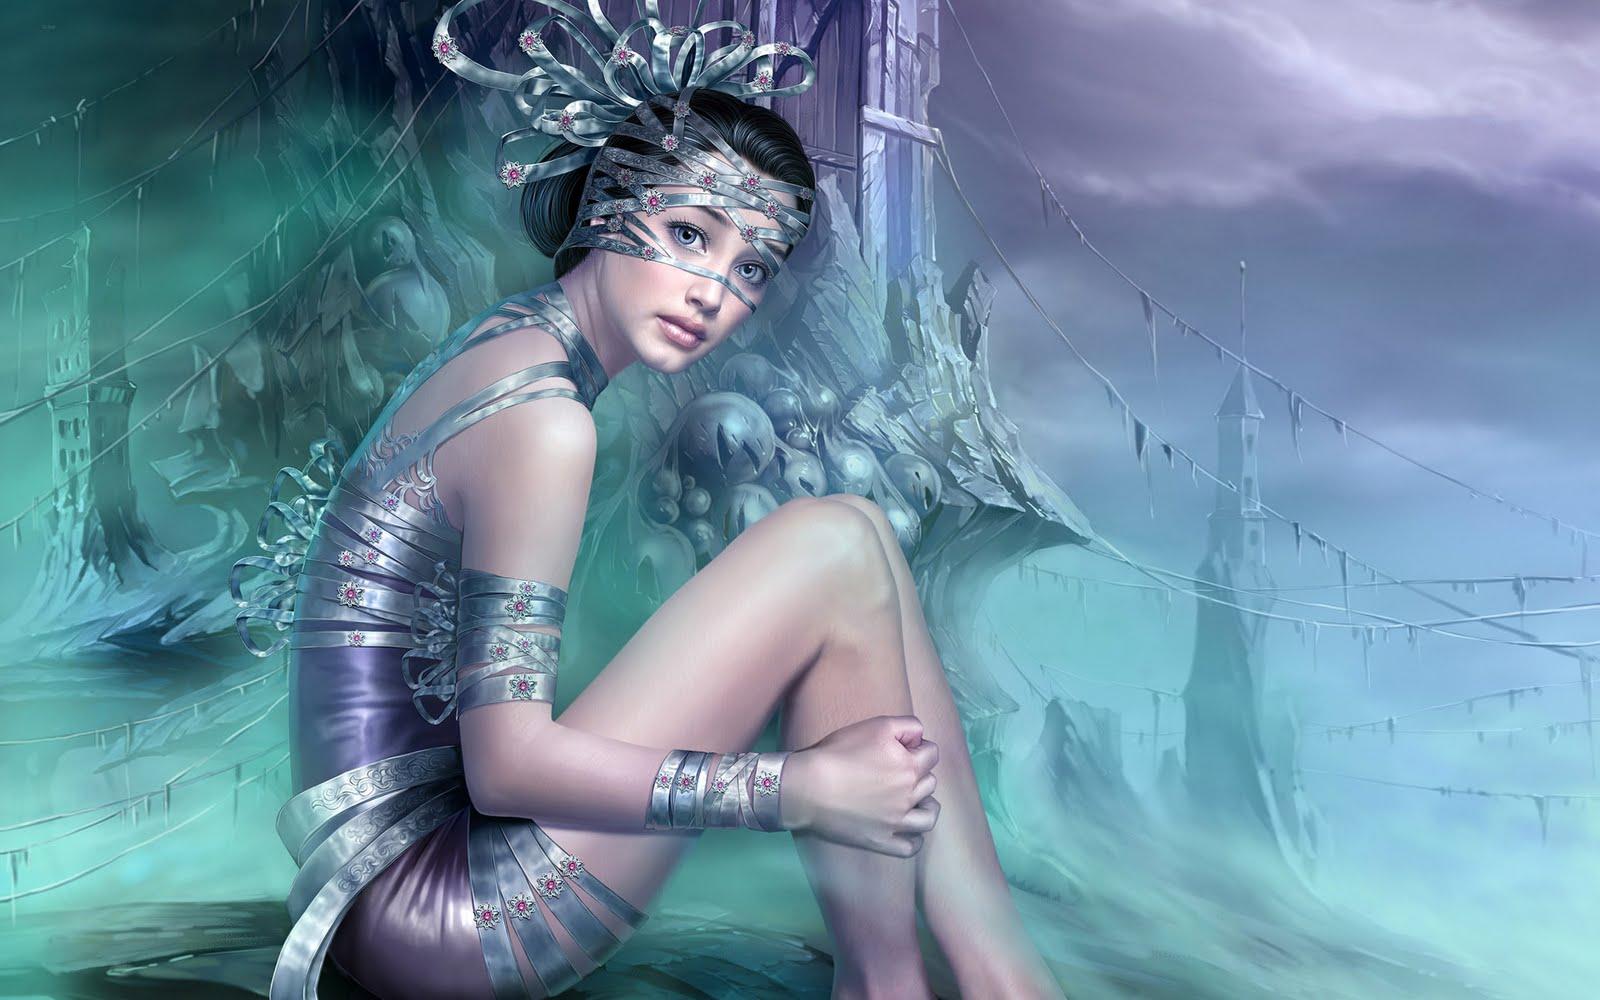 Funny Wallpapers Jokes Fantasy girl Pc desktop HD paintingswallpaper 1600x1000